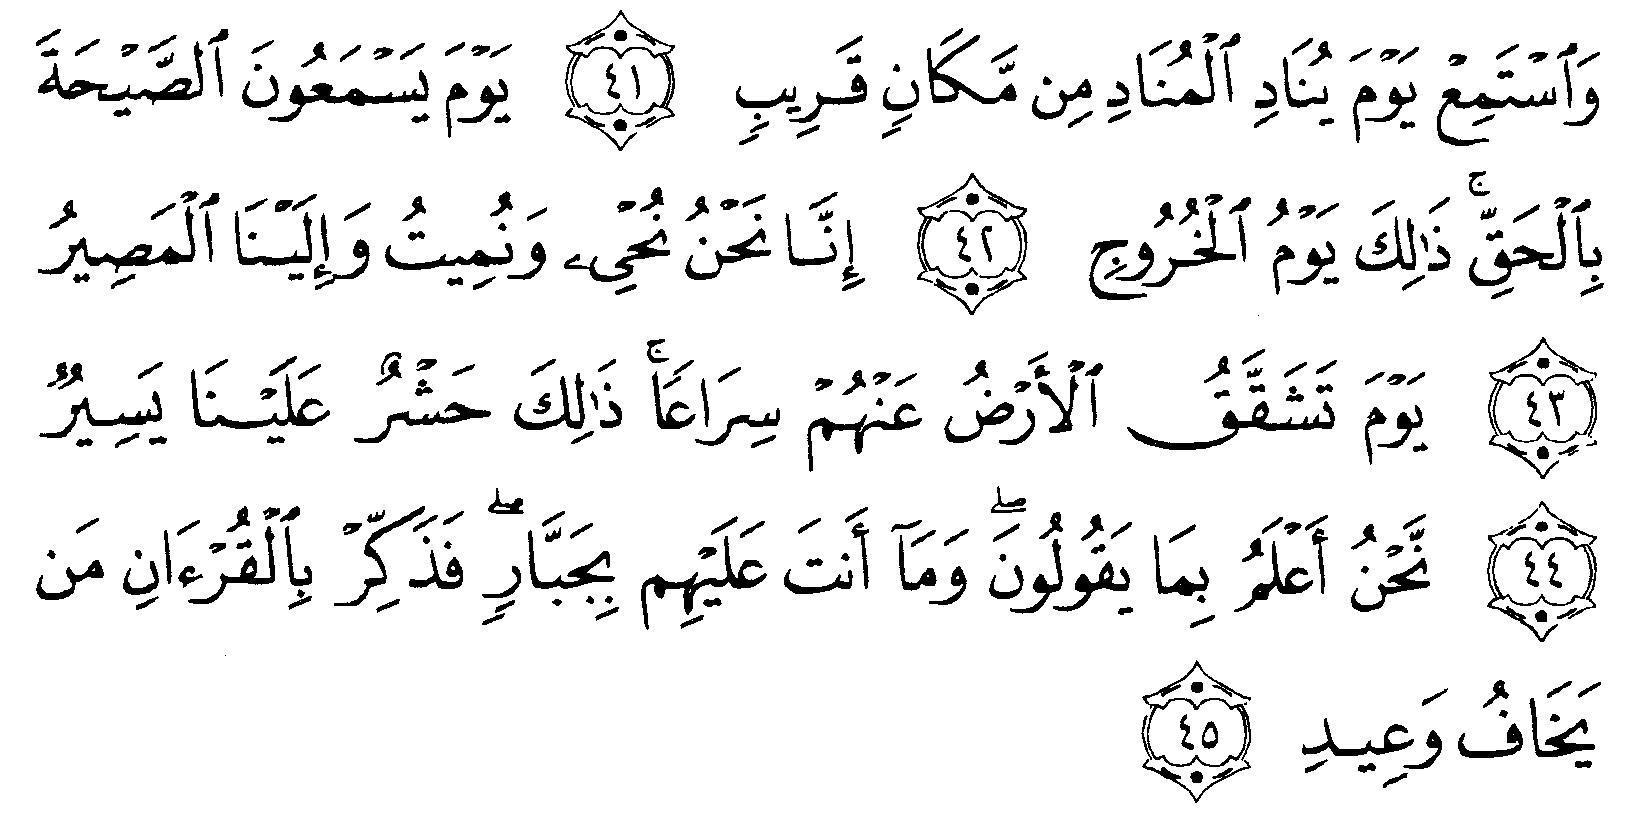 Tafsir Ibnu Katsir Surah Qaaf Alquranmulia